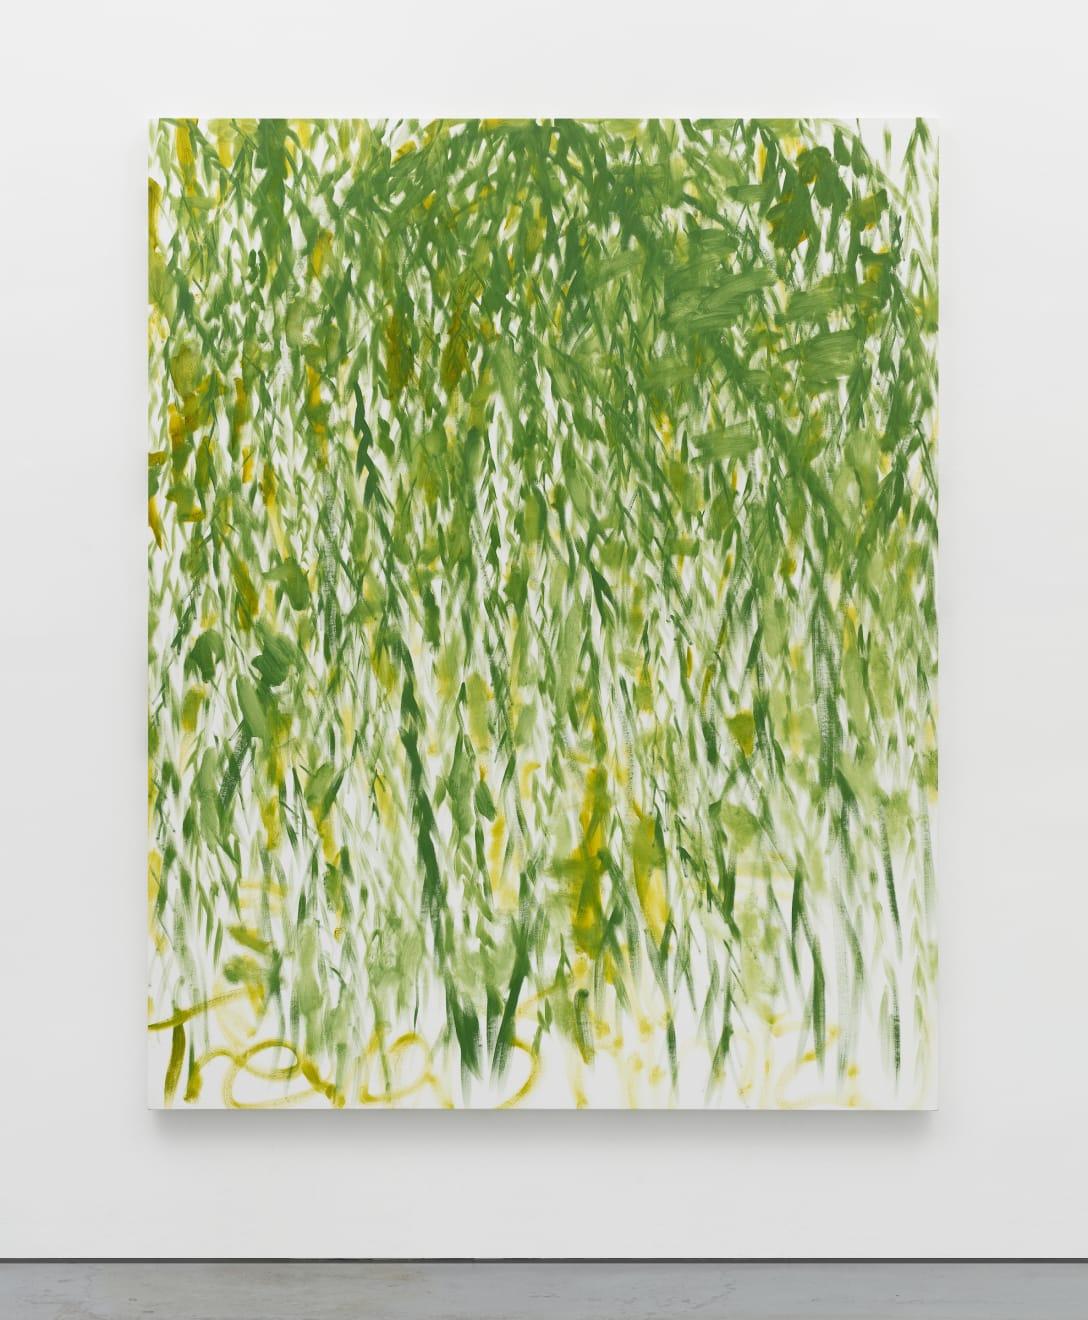 Trevor Shimizu, Weeping Willow (4), 2019